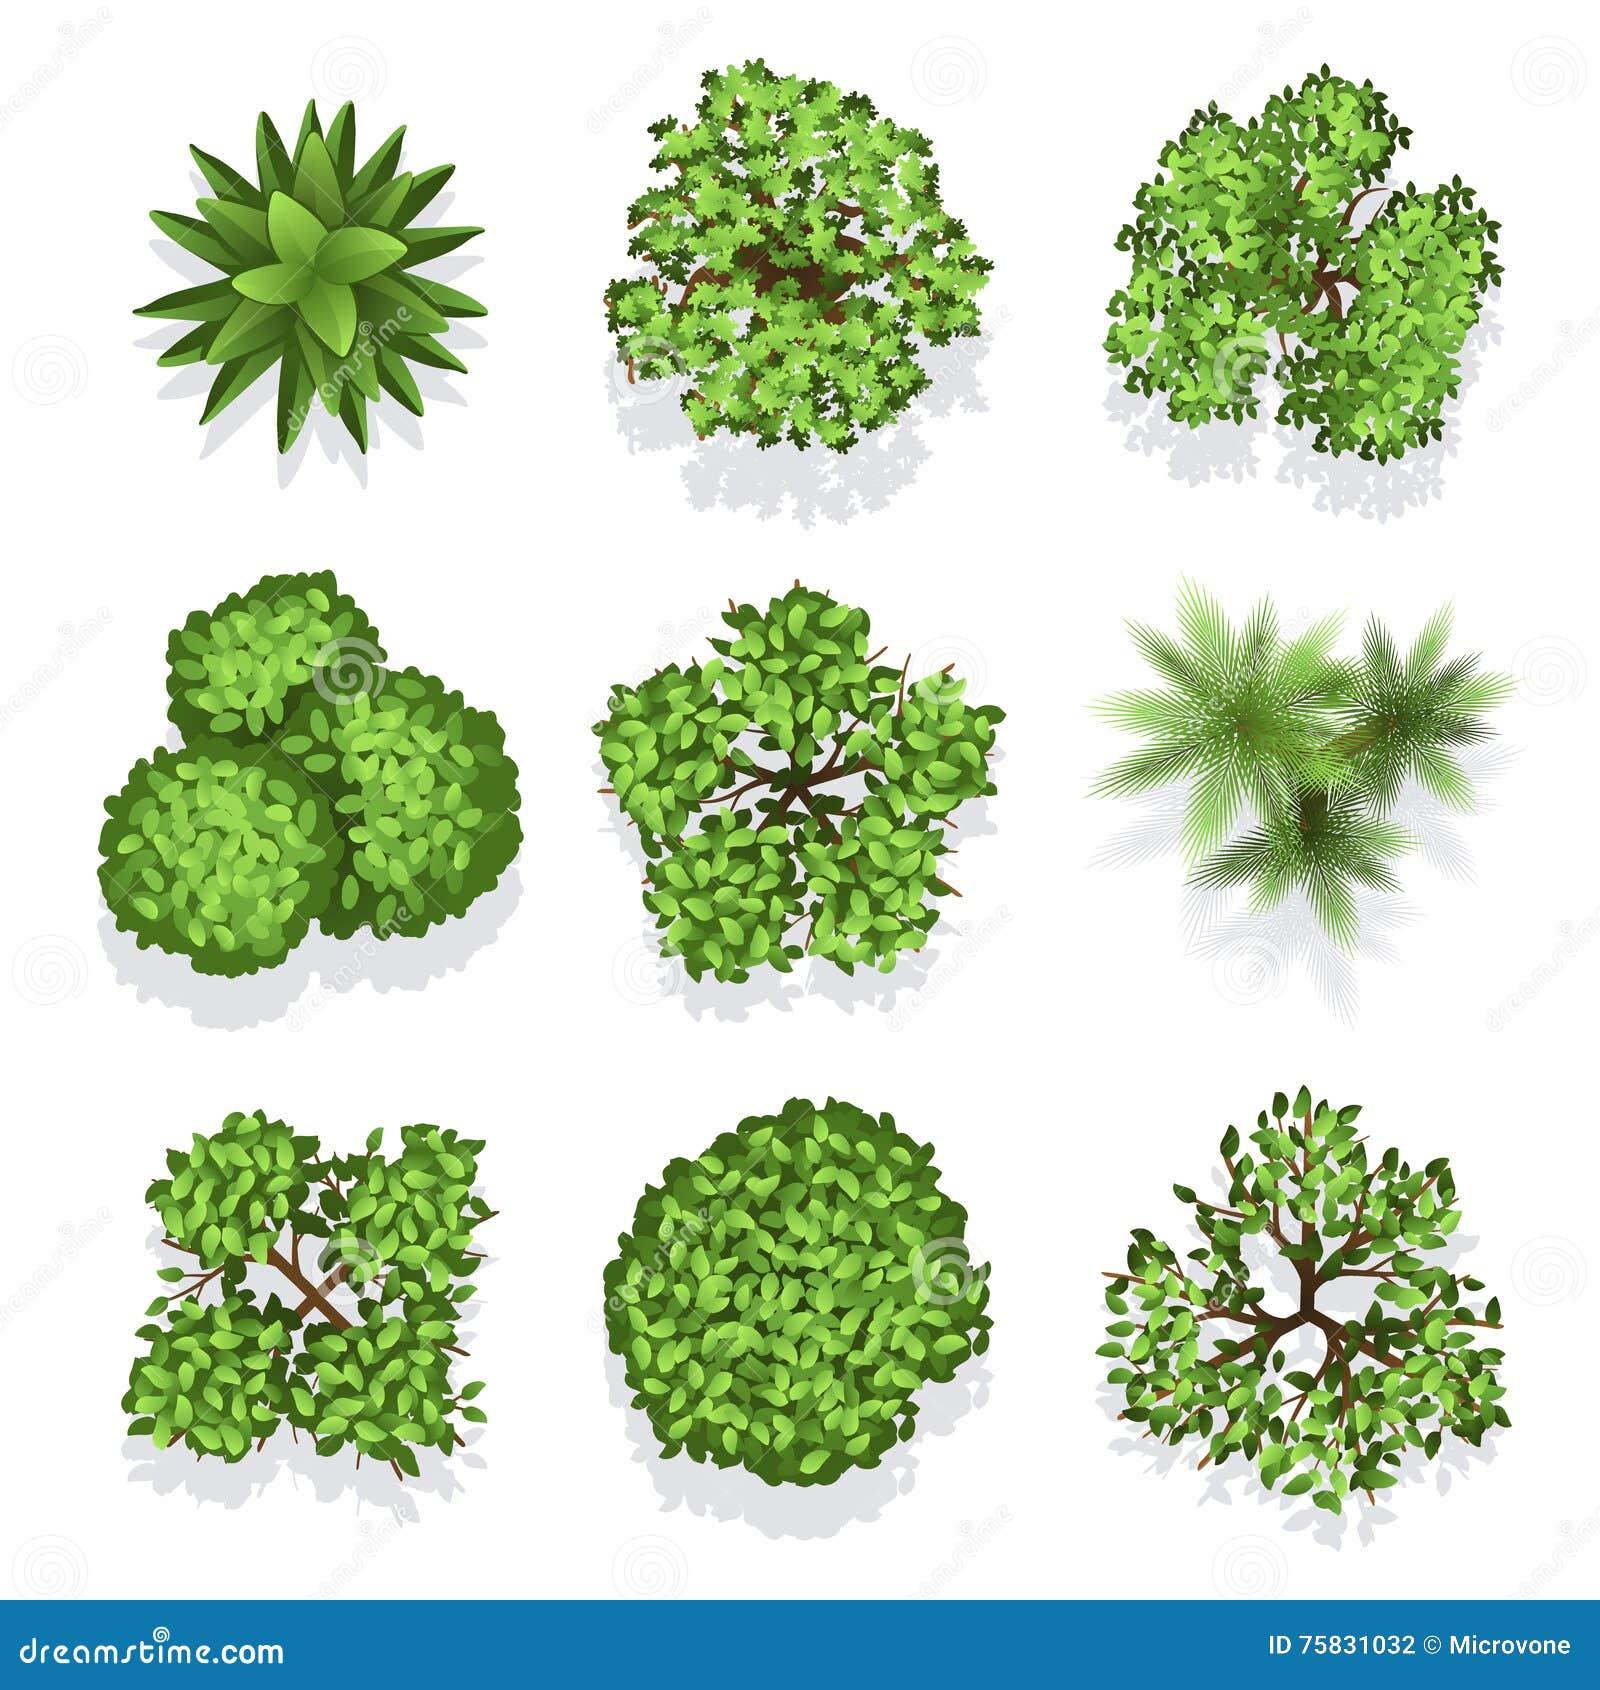 Branch cartoons illustrations vector stock images for Different landscape design